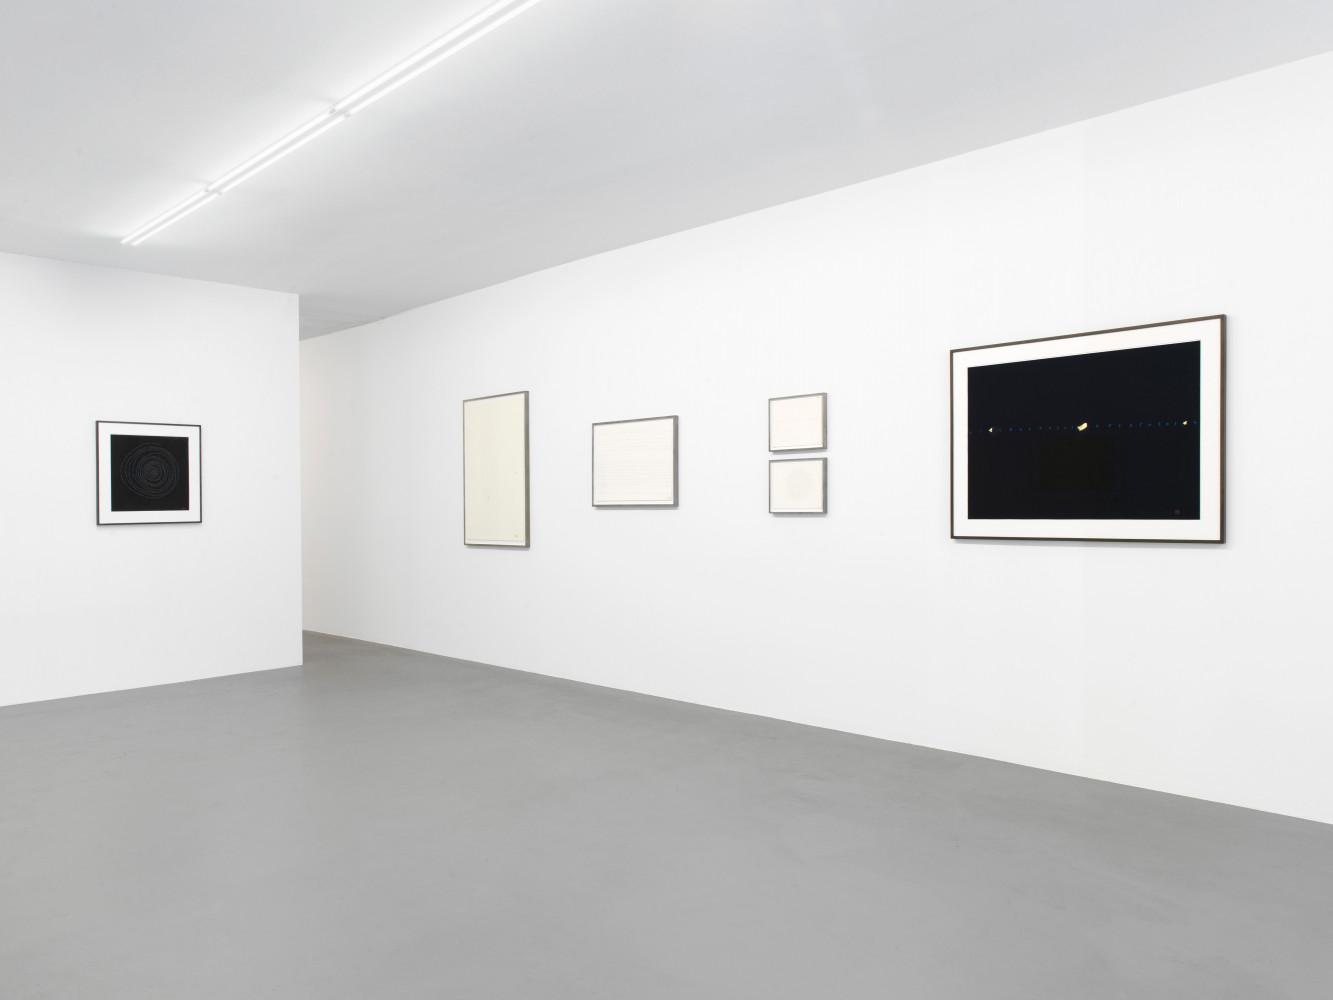 Tatsuo Miyajima, Installation view, Buchmann Box, 2018